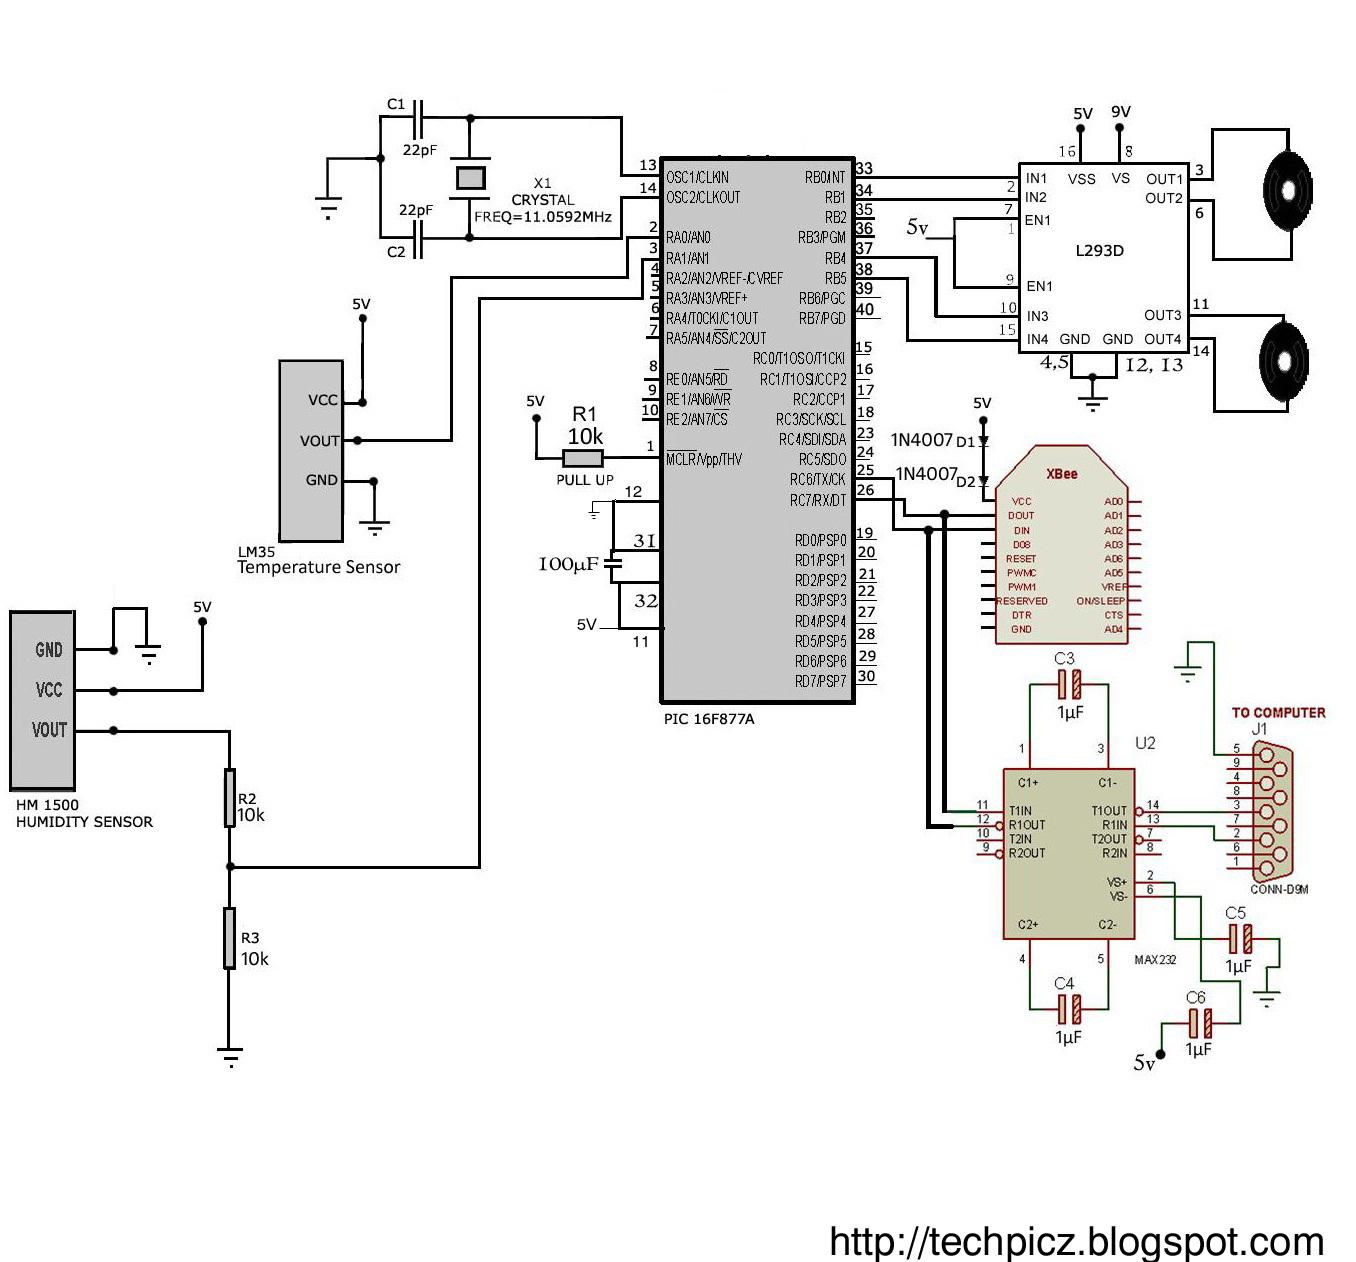 Techpicz Atmospheric Measurements Using Wireless Robot